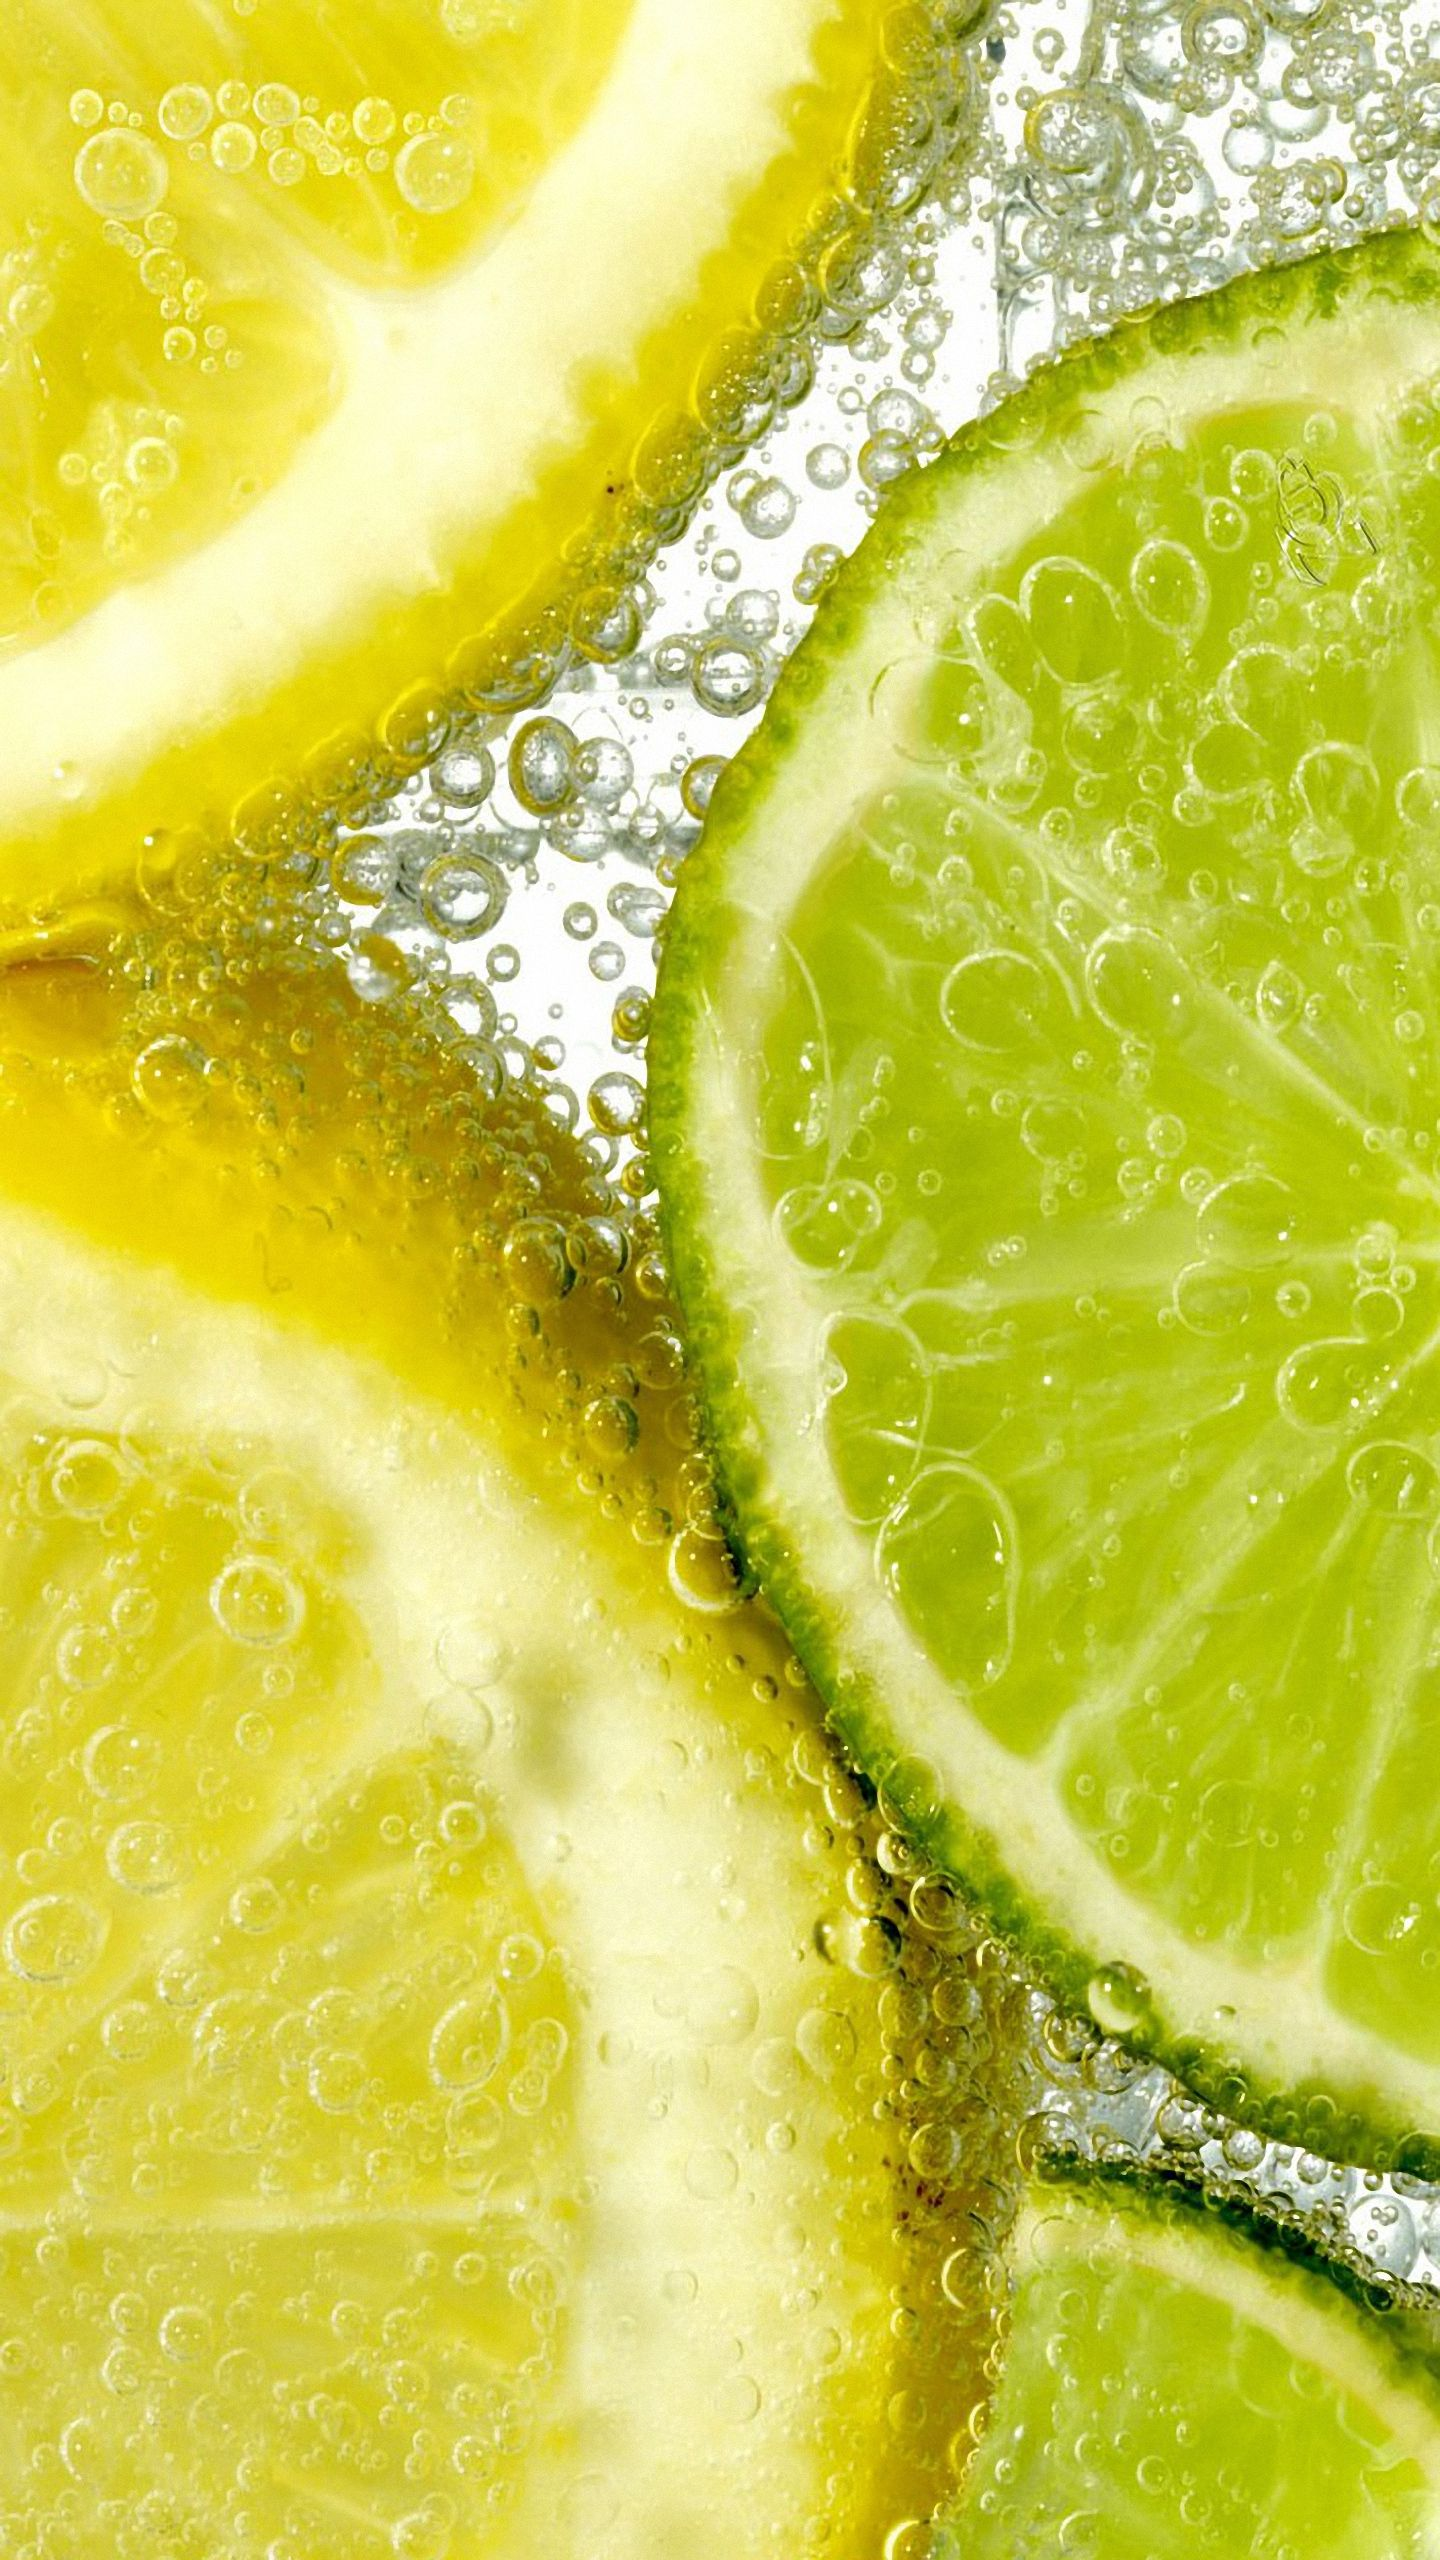 Lemon And Lime Fruit Food Fruit Wallpaper Orange Wallpaper